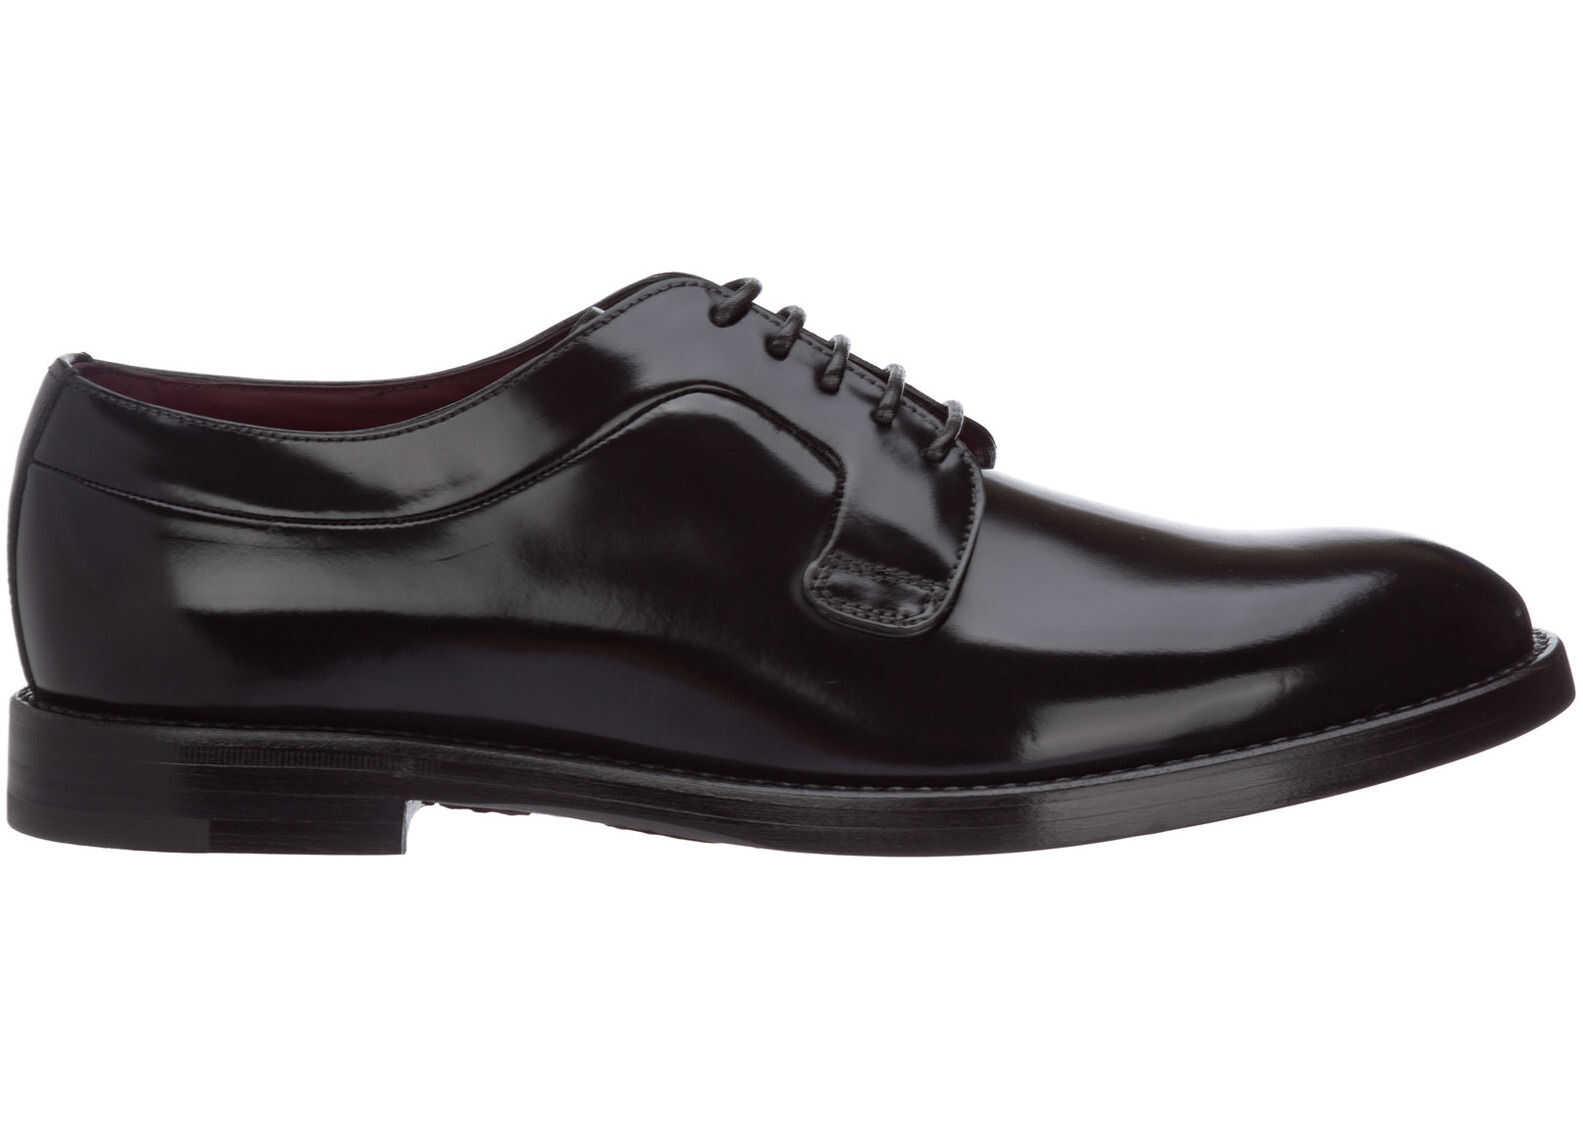 Dolce & Gabbana Shoes Derby A10650A120380999 Black imagine b-mall.ro